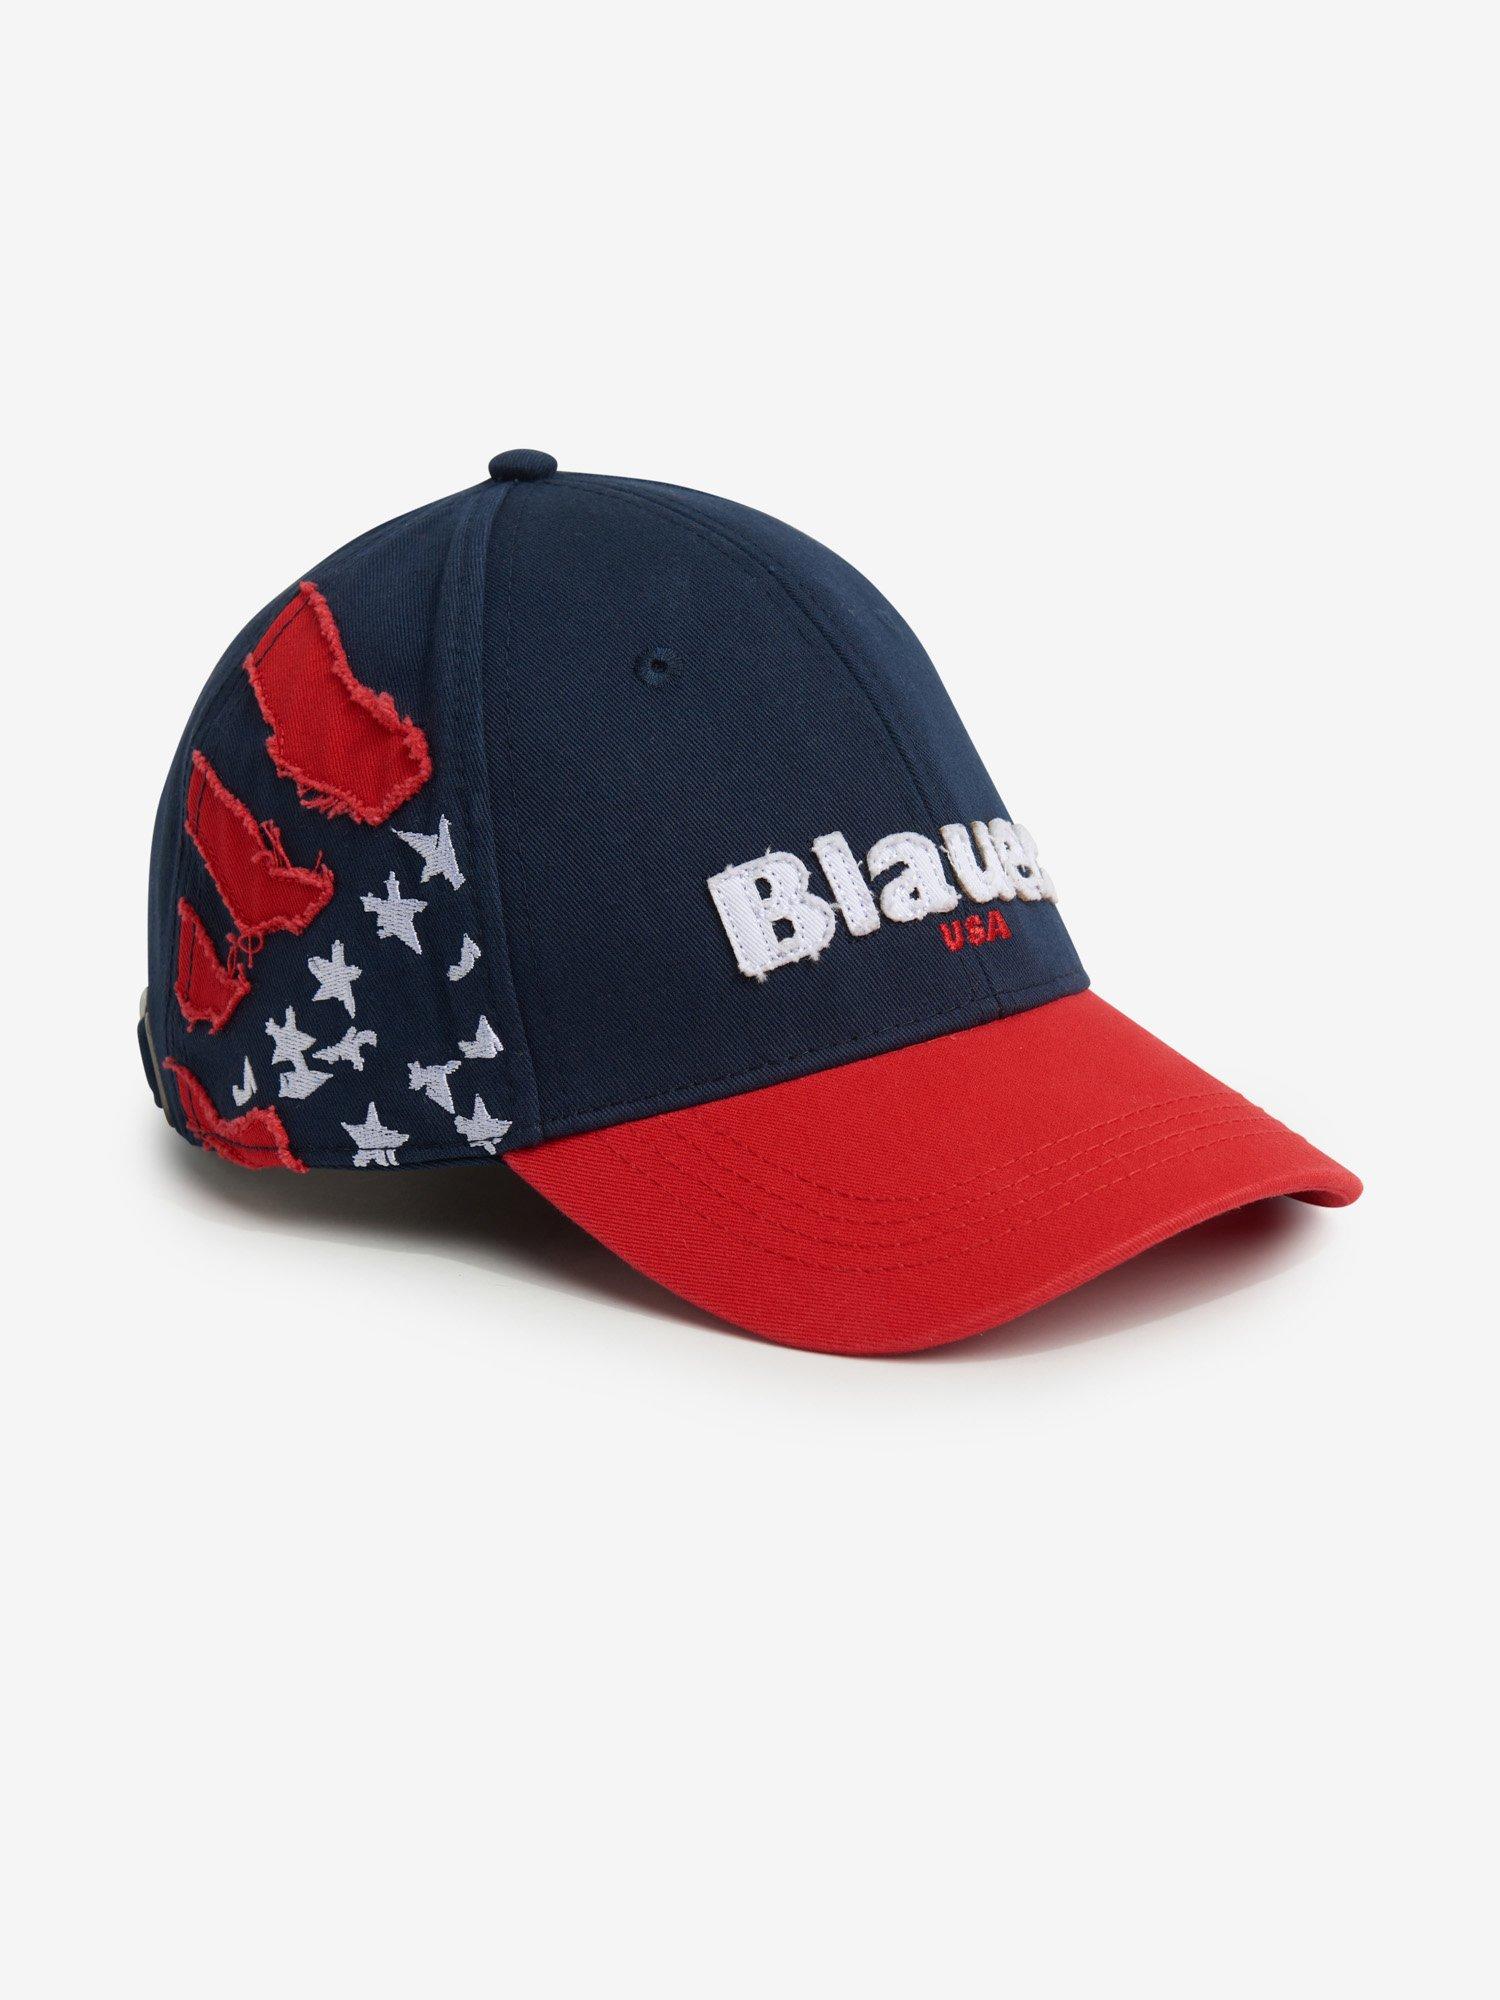 BLAUER 36 BASEBALL CAP - Blauer